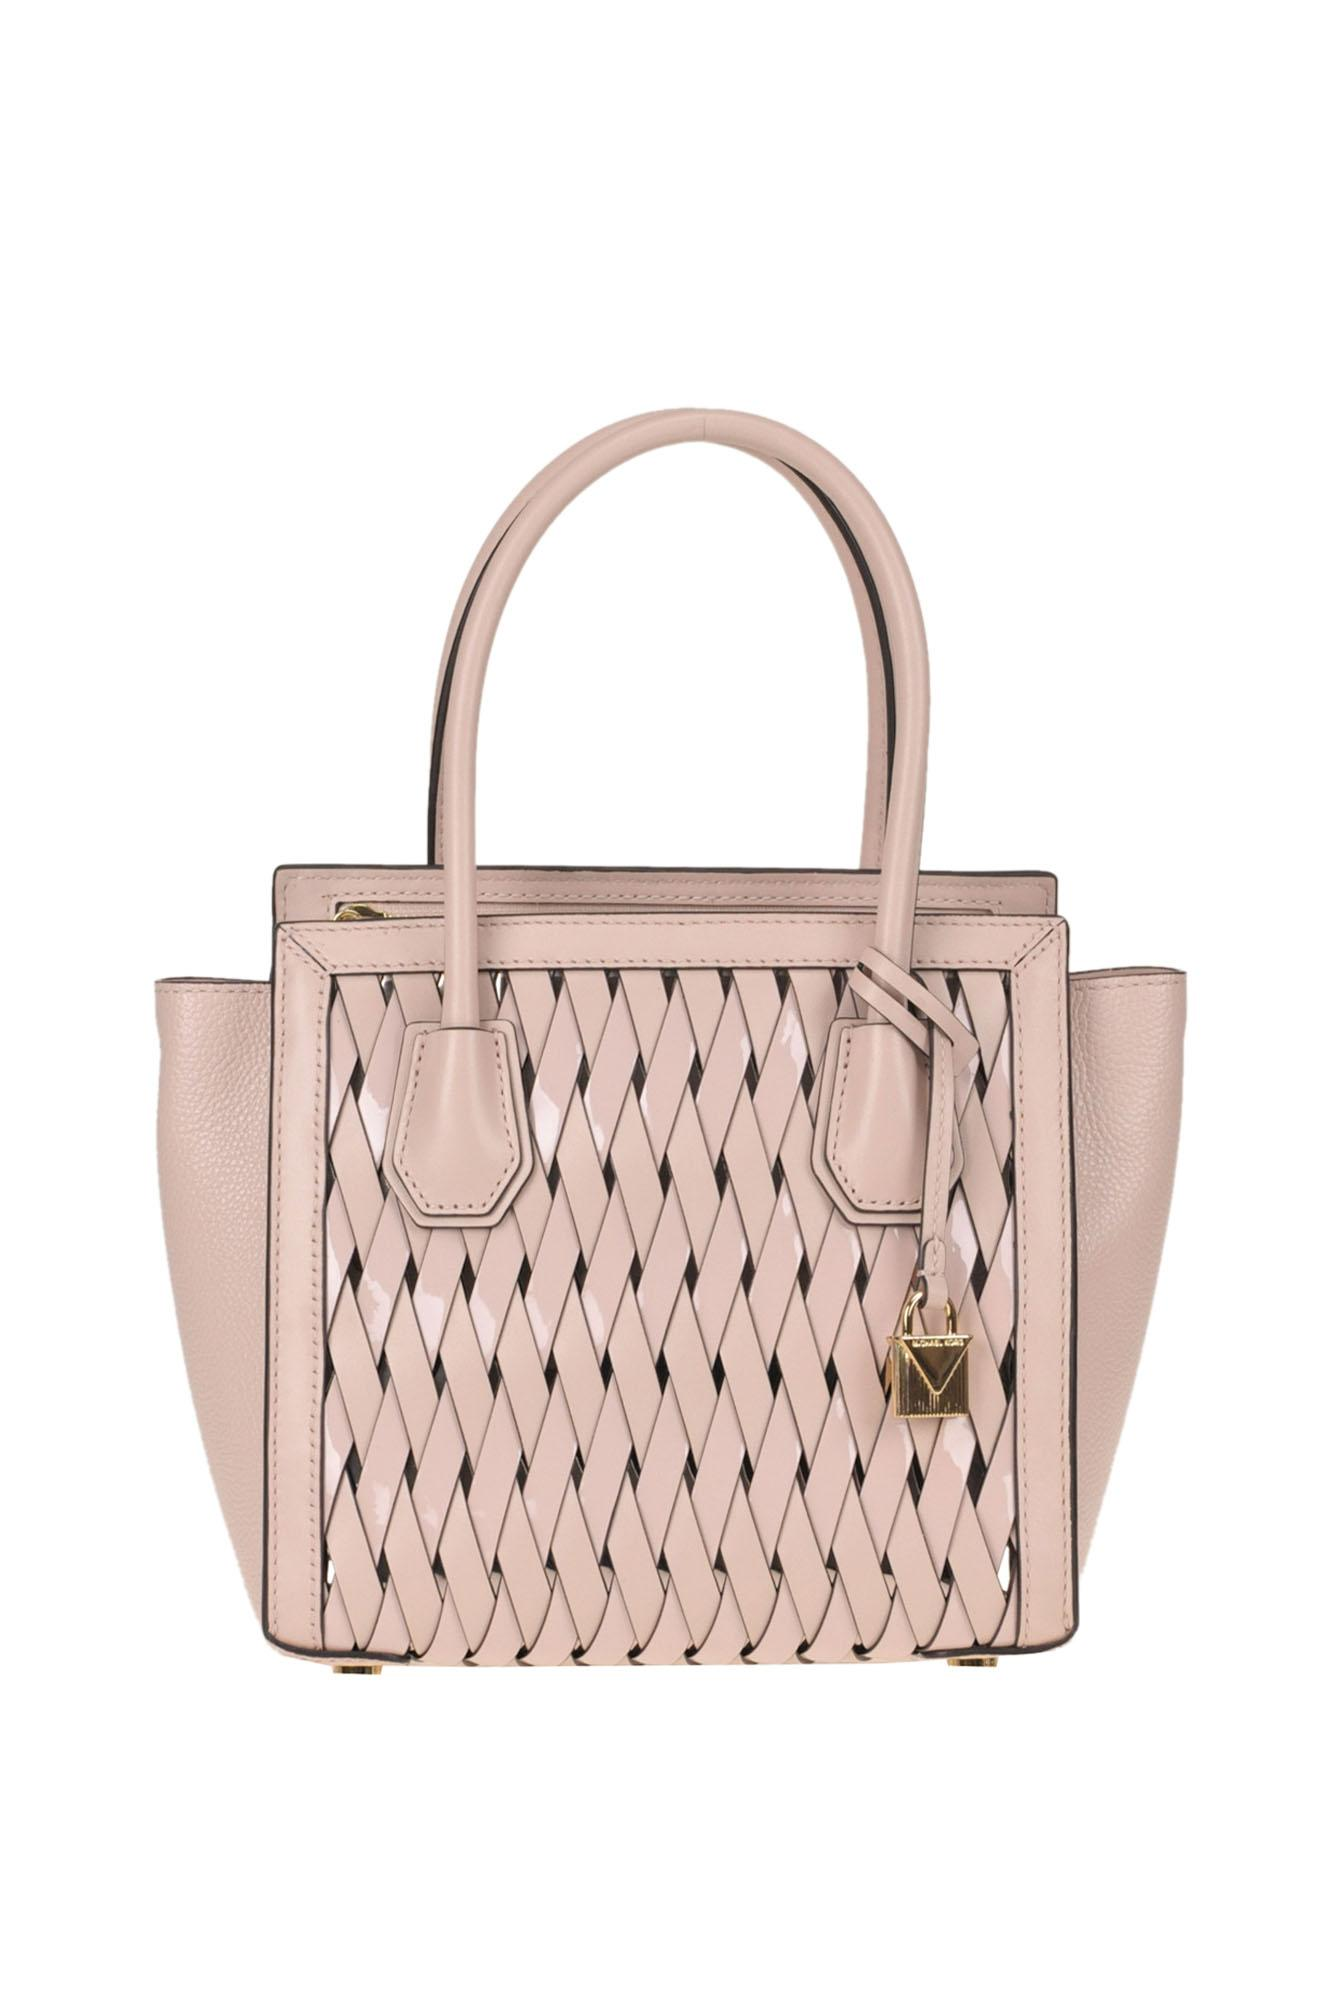 09ad7c26fec1 Lyst - MICHAEL Michael Kors  mercer Studio Md  Bag in Pink